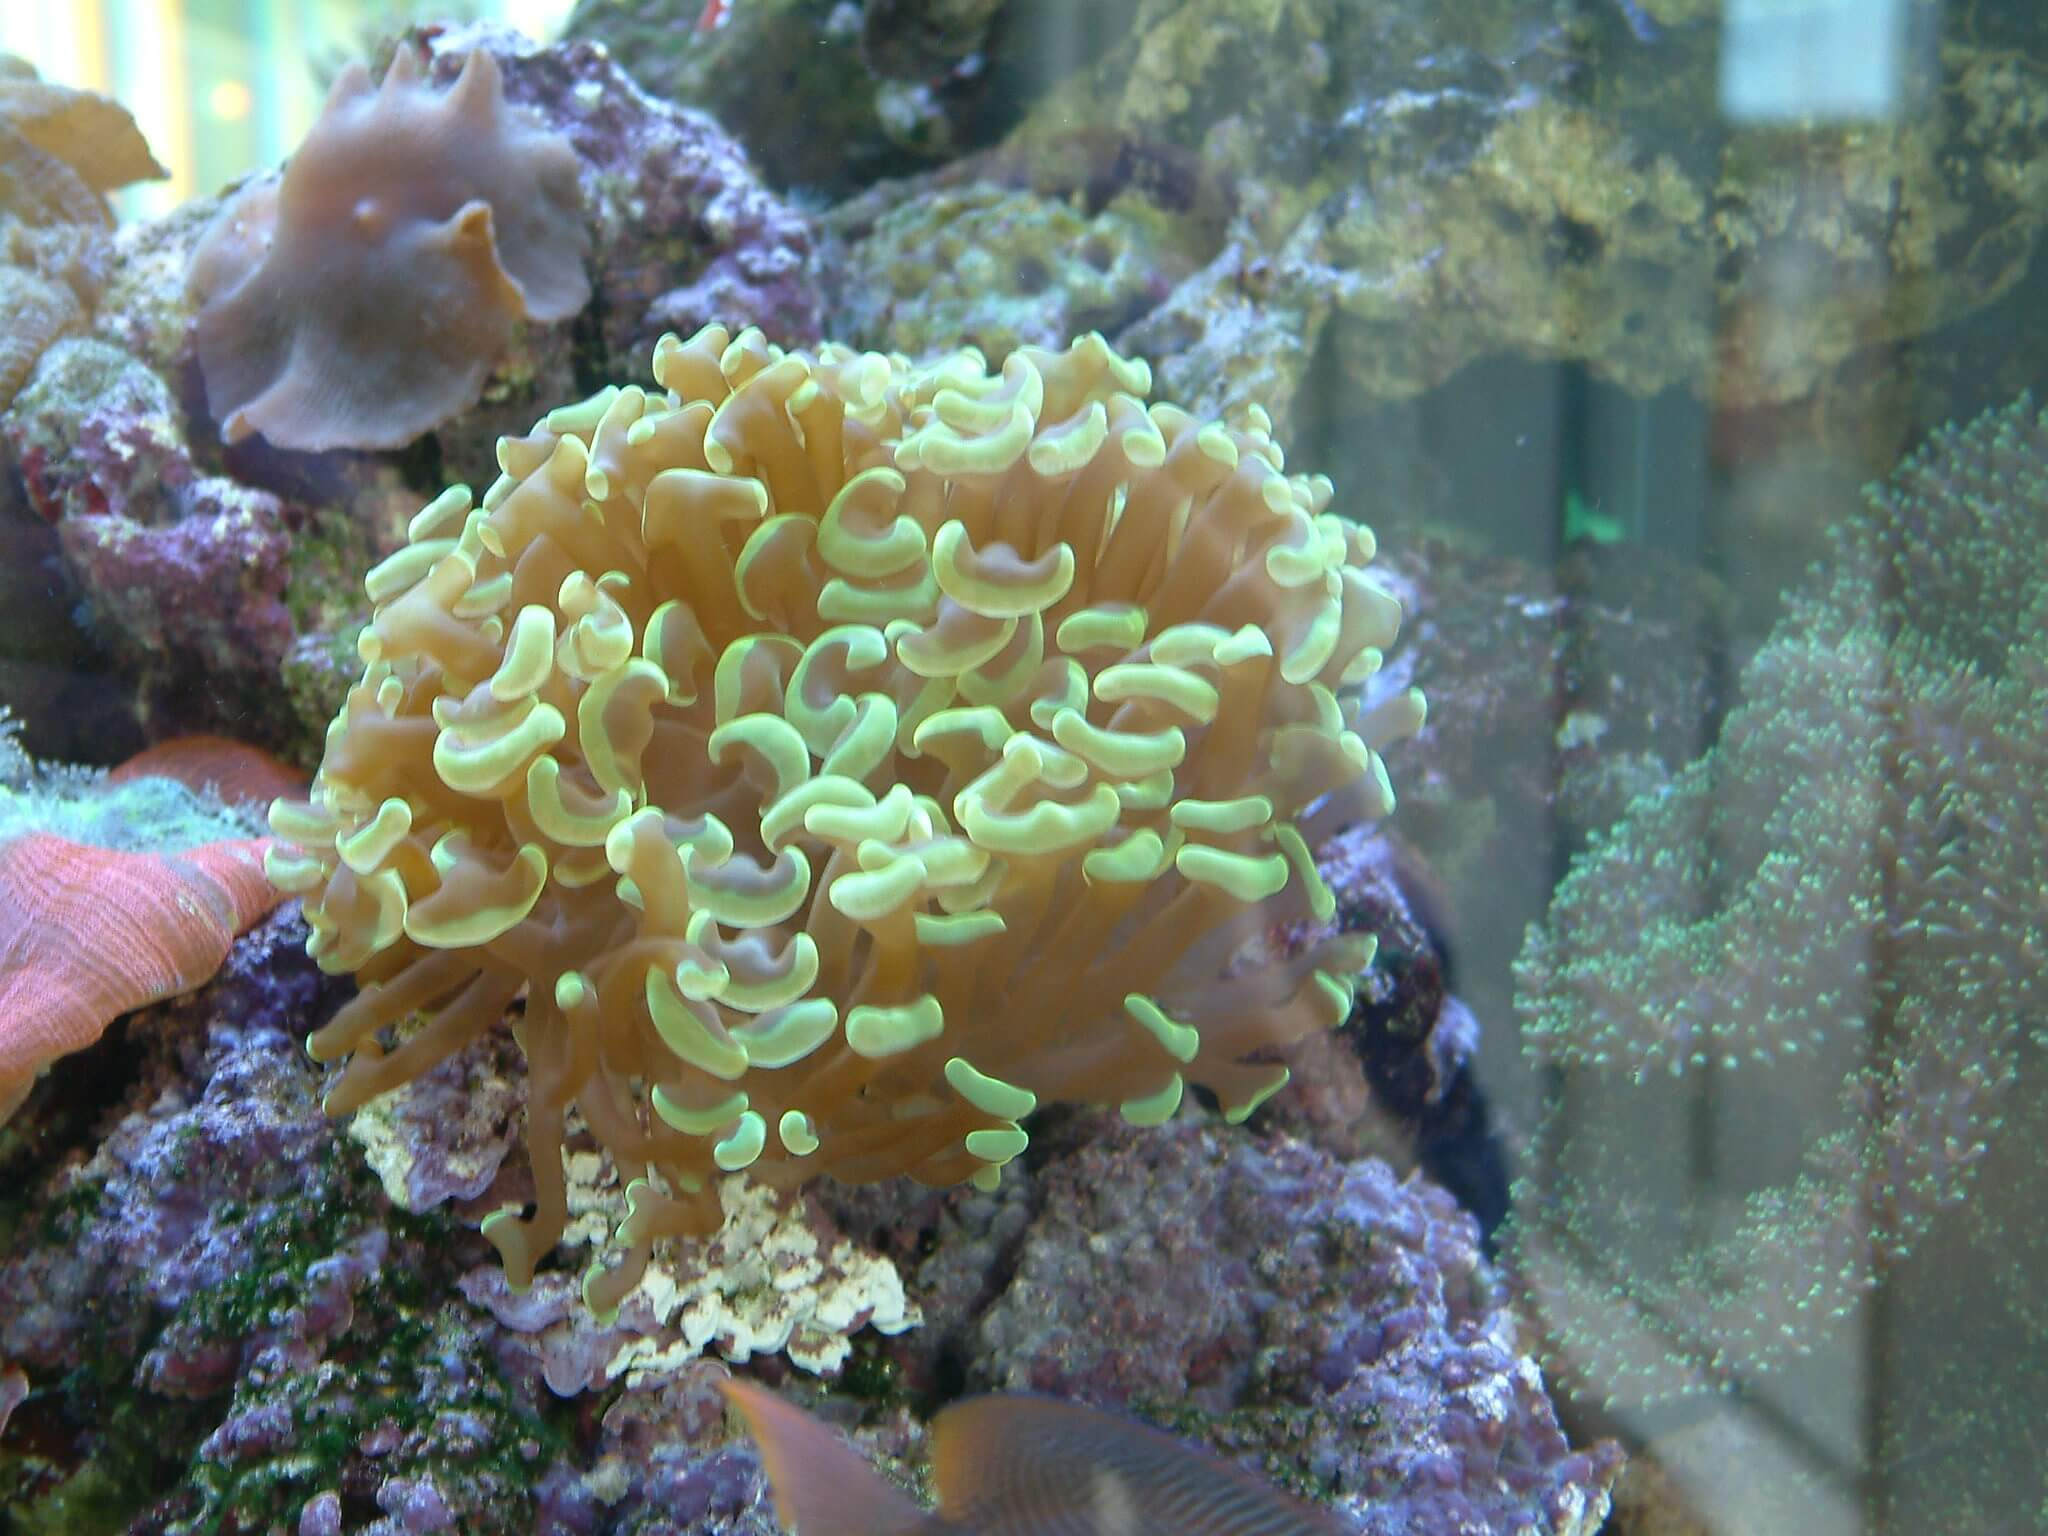 beliebte lps korallen f r anf nger im meerwasseraquarium. Black Bedroom Furniture Sets. Home Design Ideas